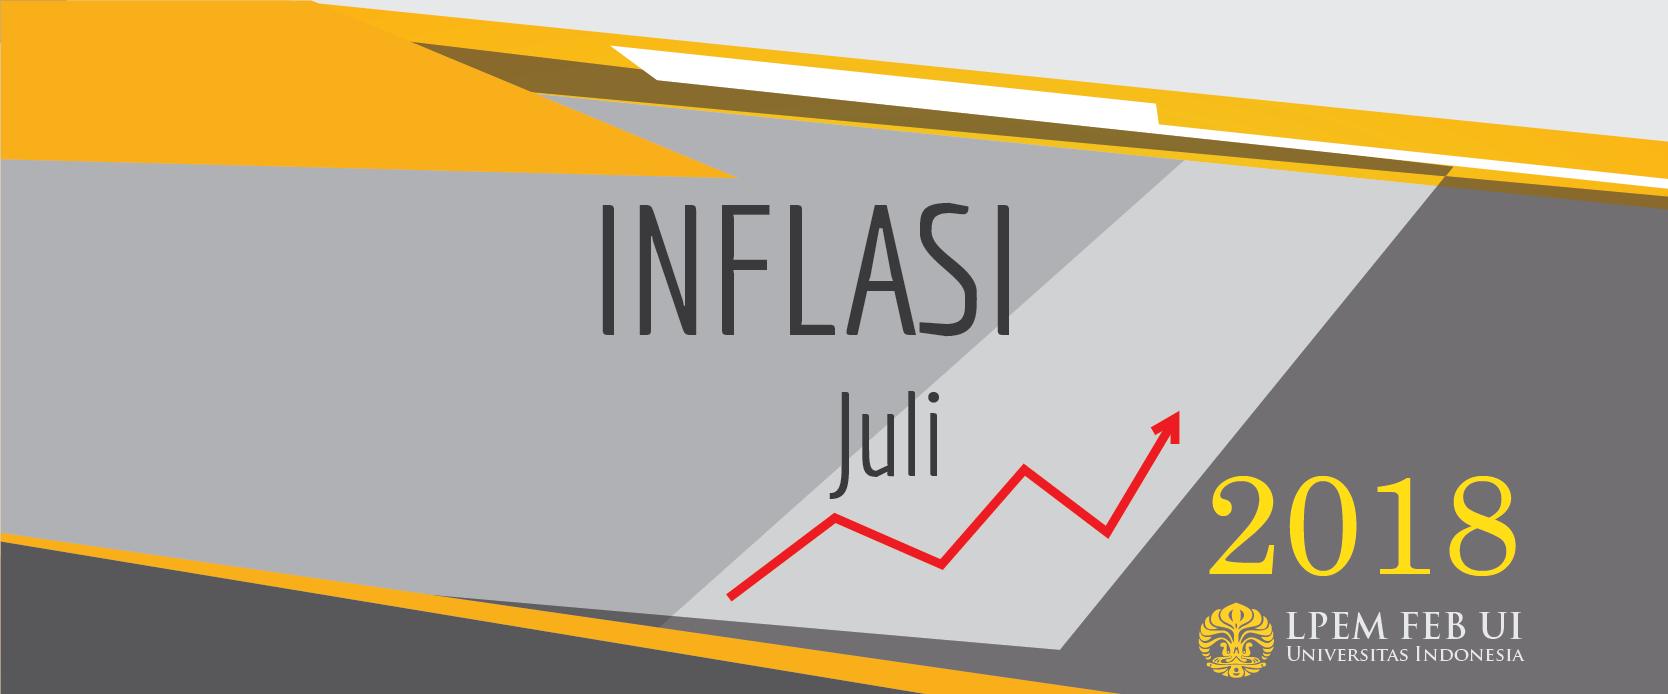 ANALISIS MAKROEKONOMI: Inflasi Juli 2018